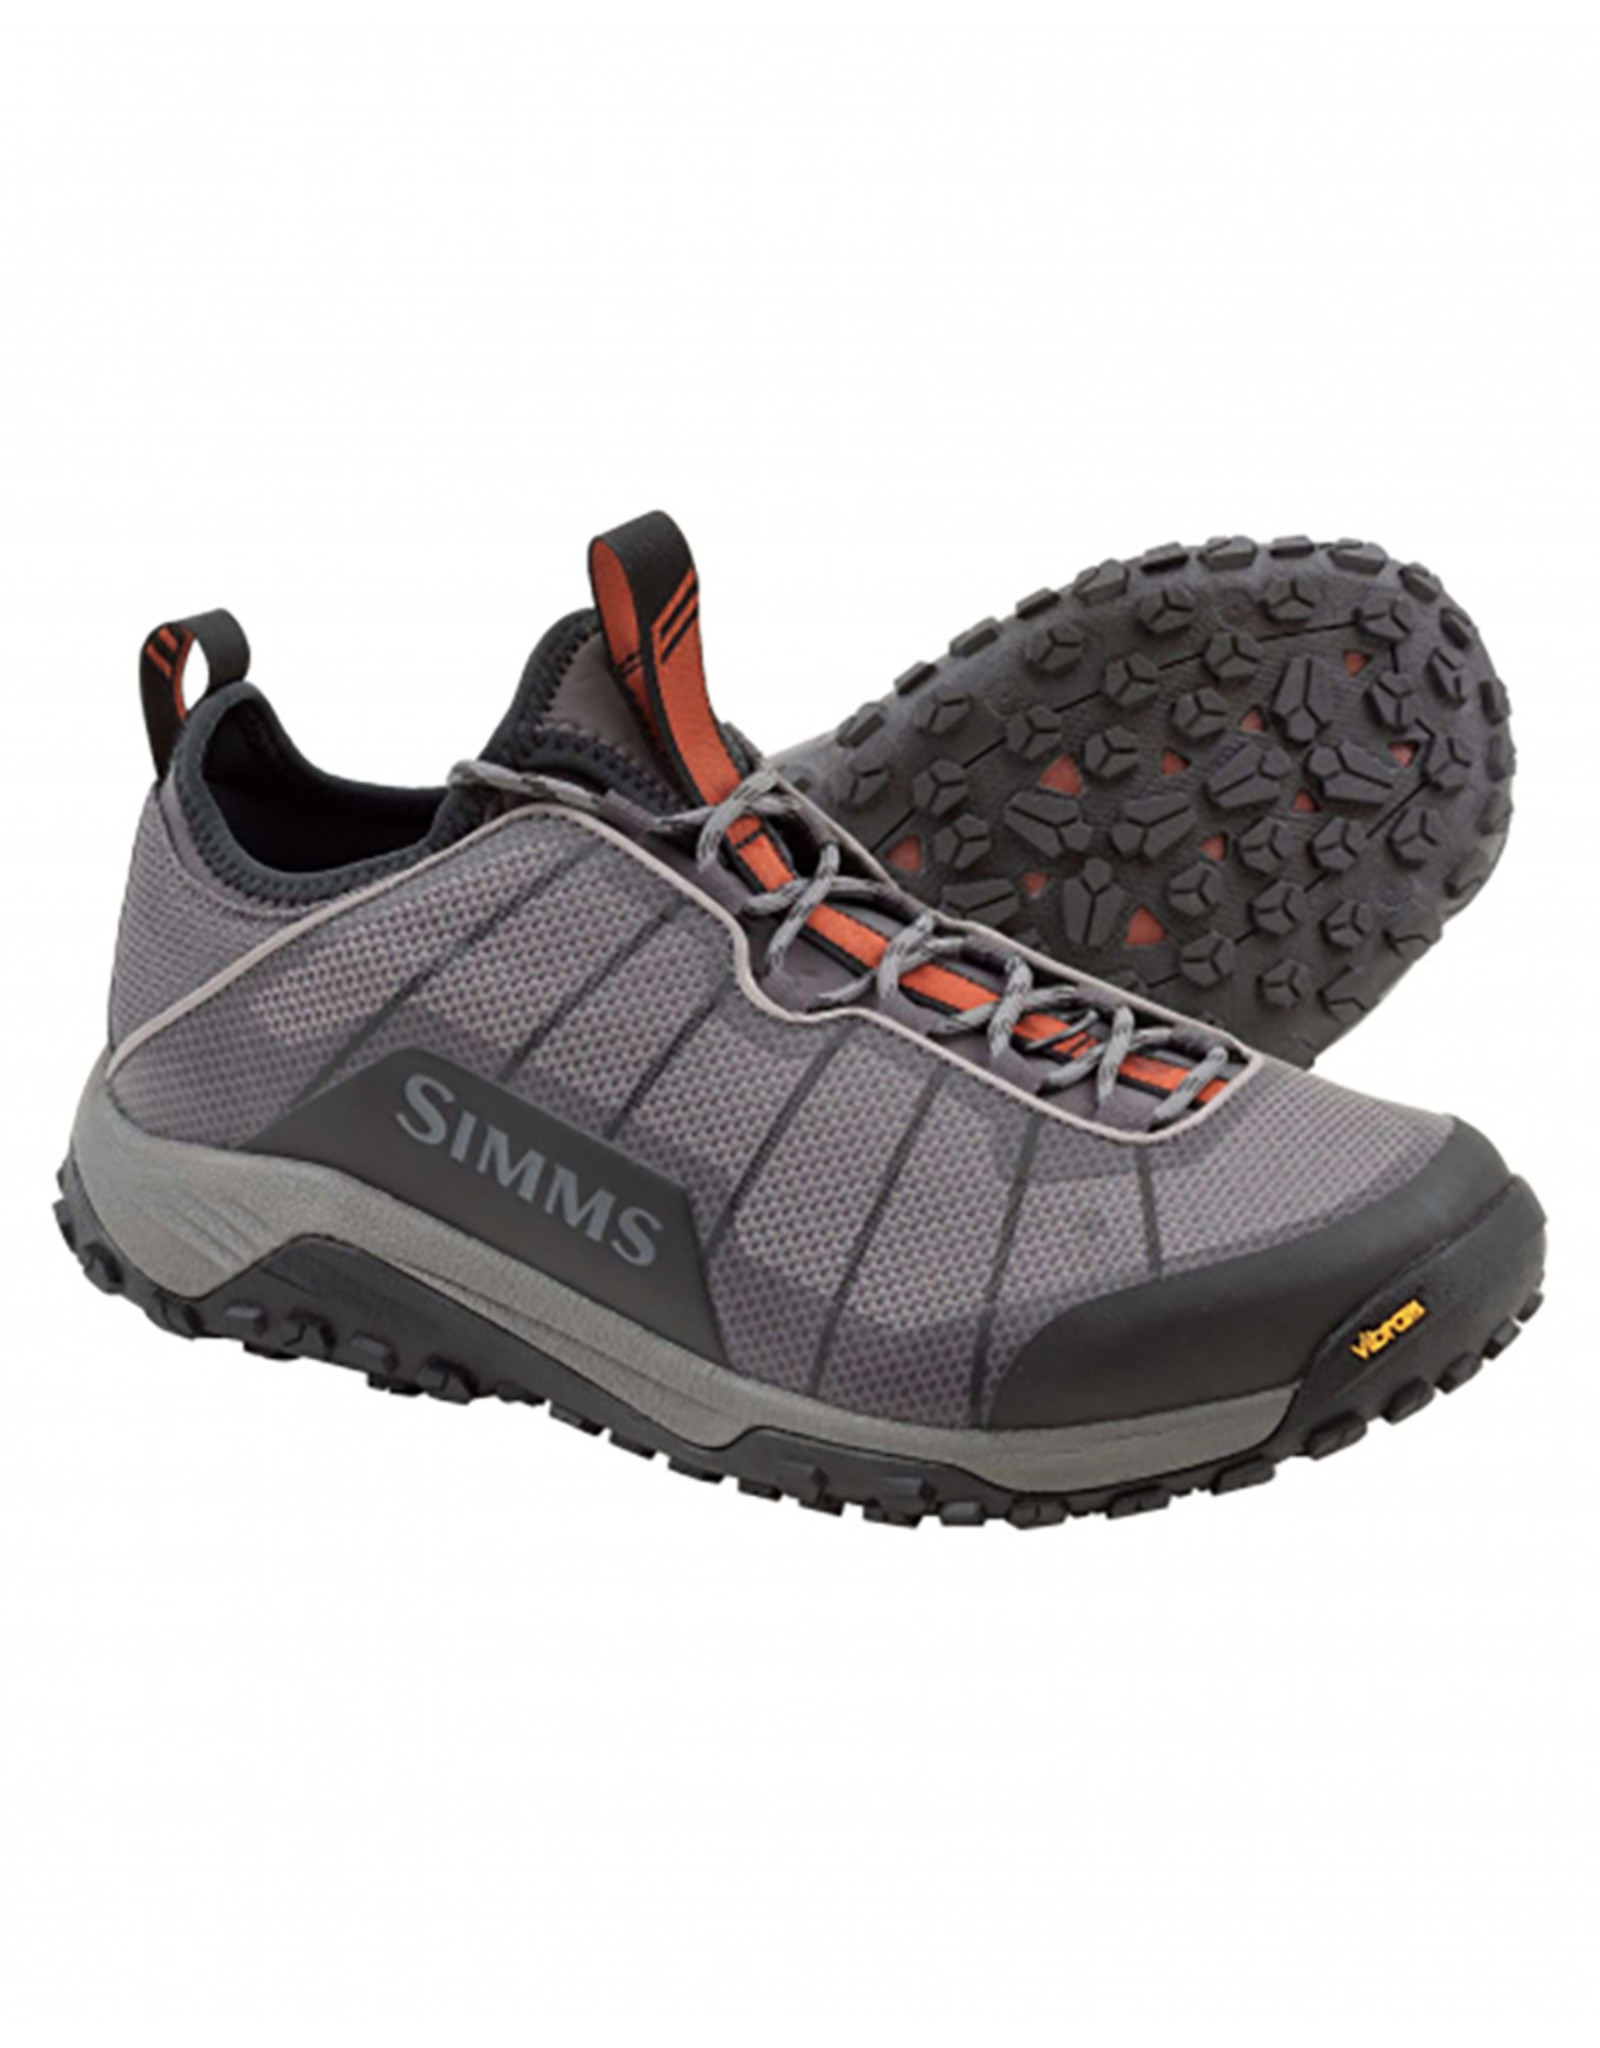 Simms M's Flyweight Wet Wading Shoe